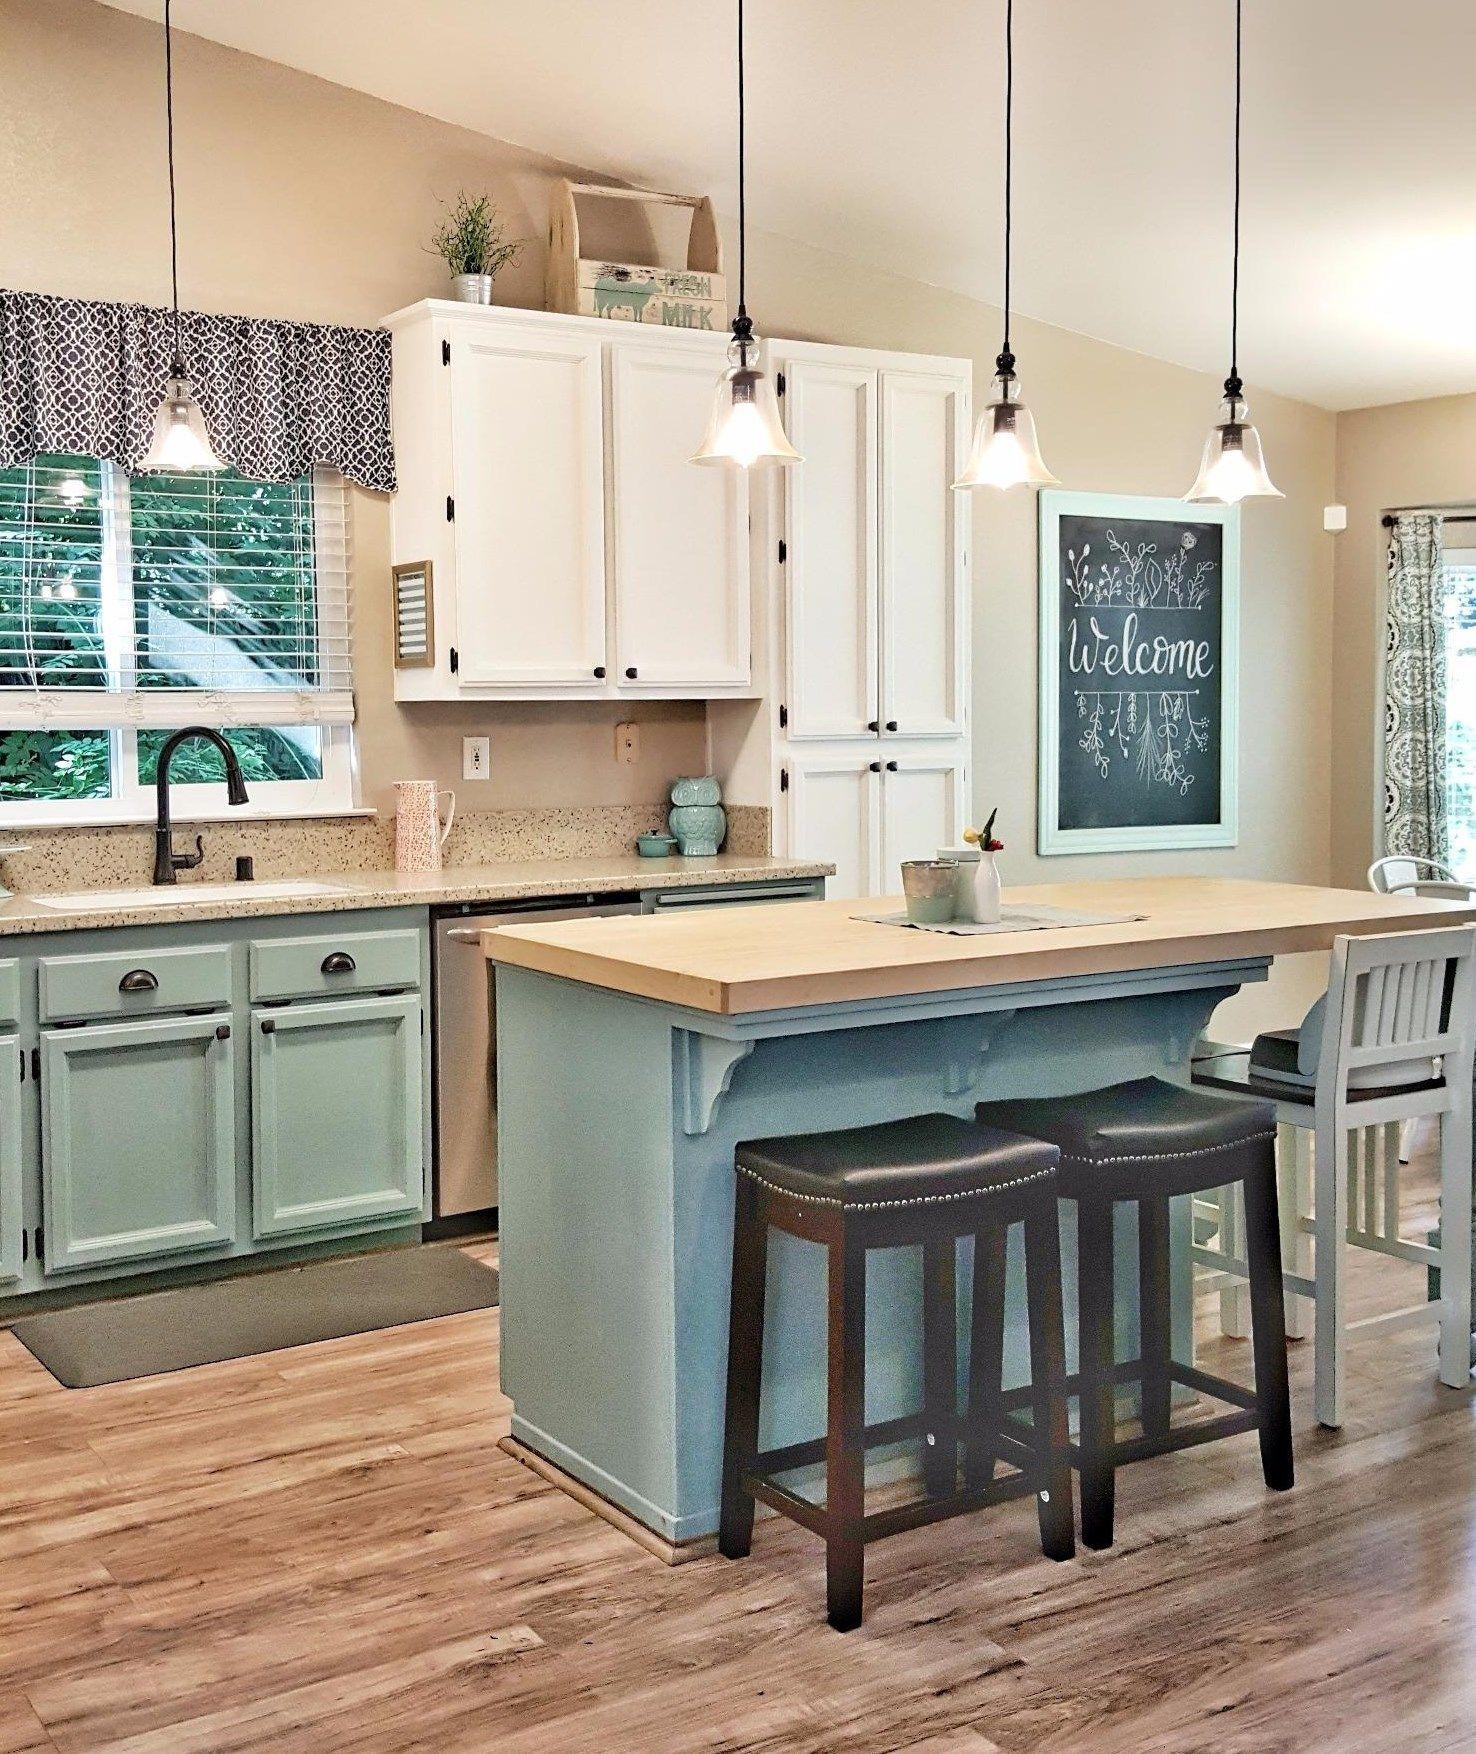 1437 Dorchester Drive, Roseville, CA 95678 | Kitchen, Home ...